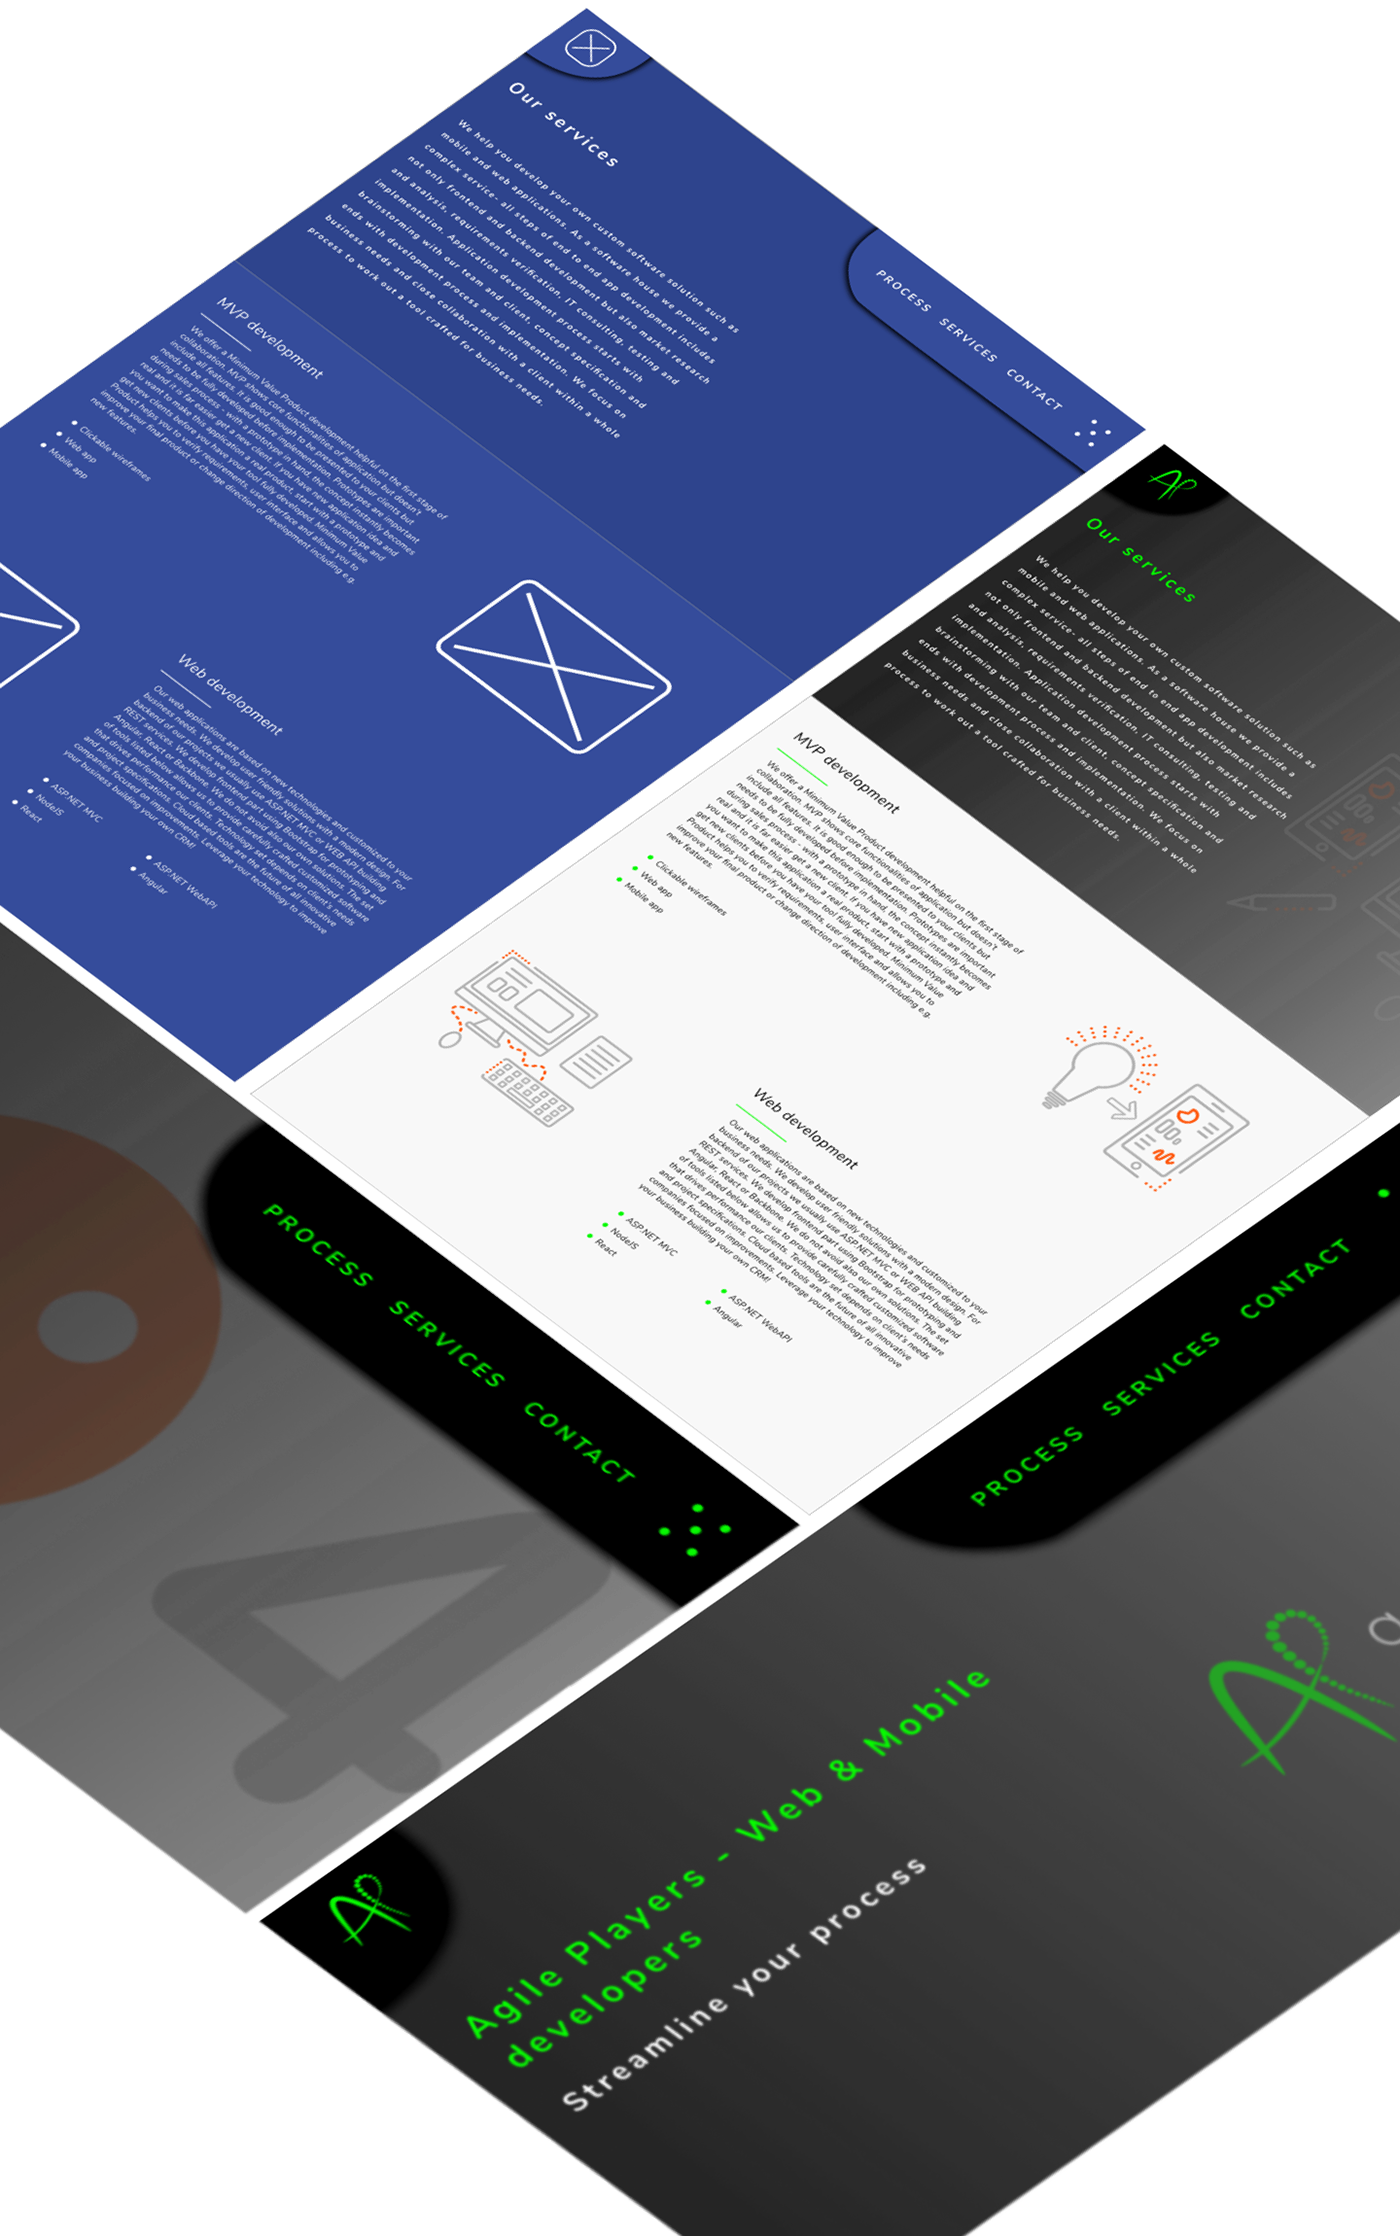 redesign agileplayers.com